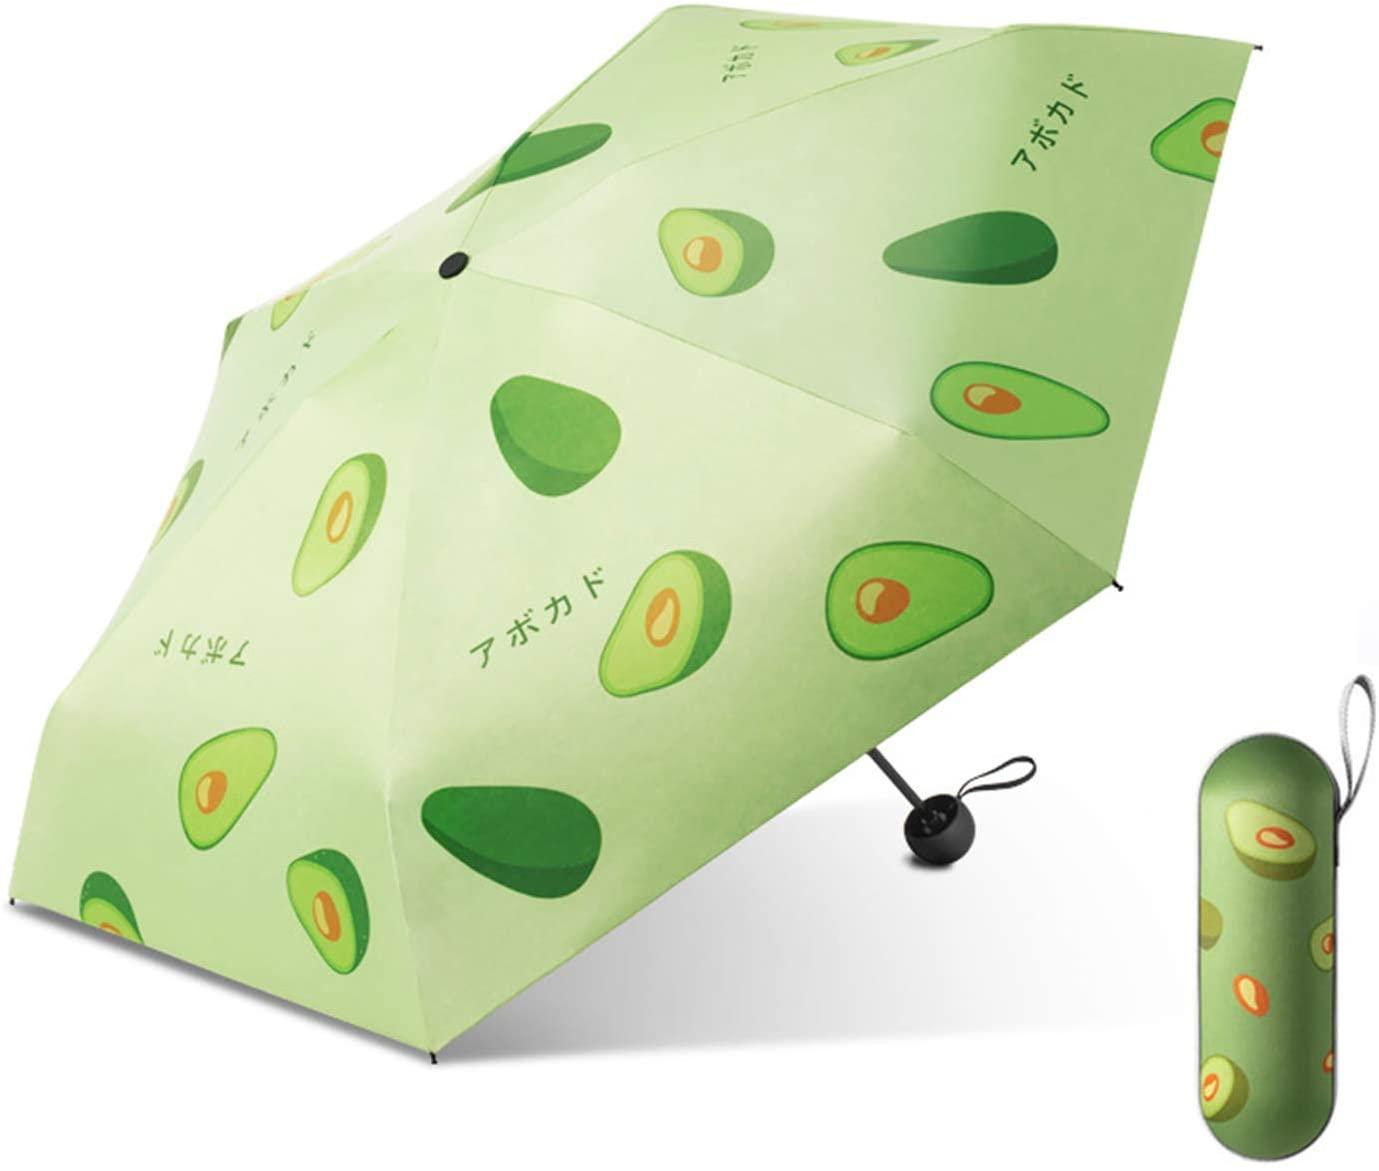 Galatée Protección UV UPF 50+ Mini Paraguas Plegable Paraguas Bloqueador Solar de Doble Capa con 8 Esqueleto de Paraguas (Aguacate)